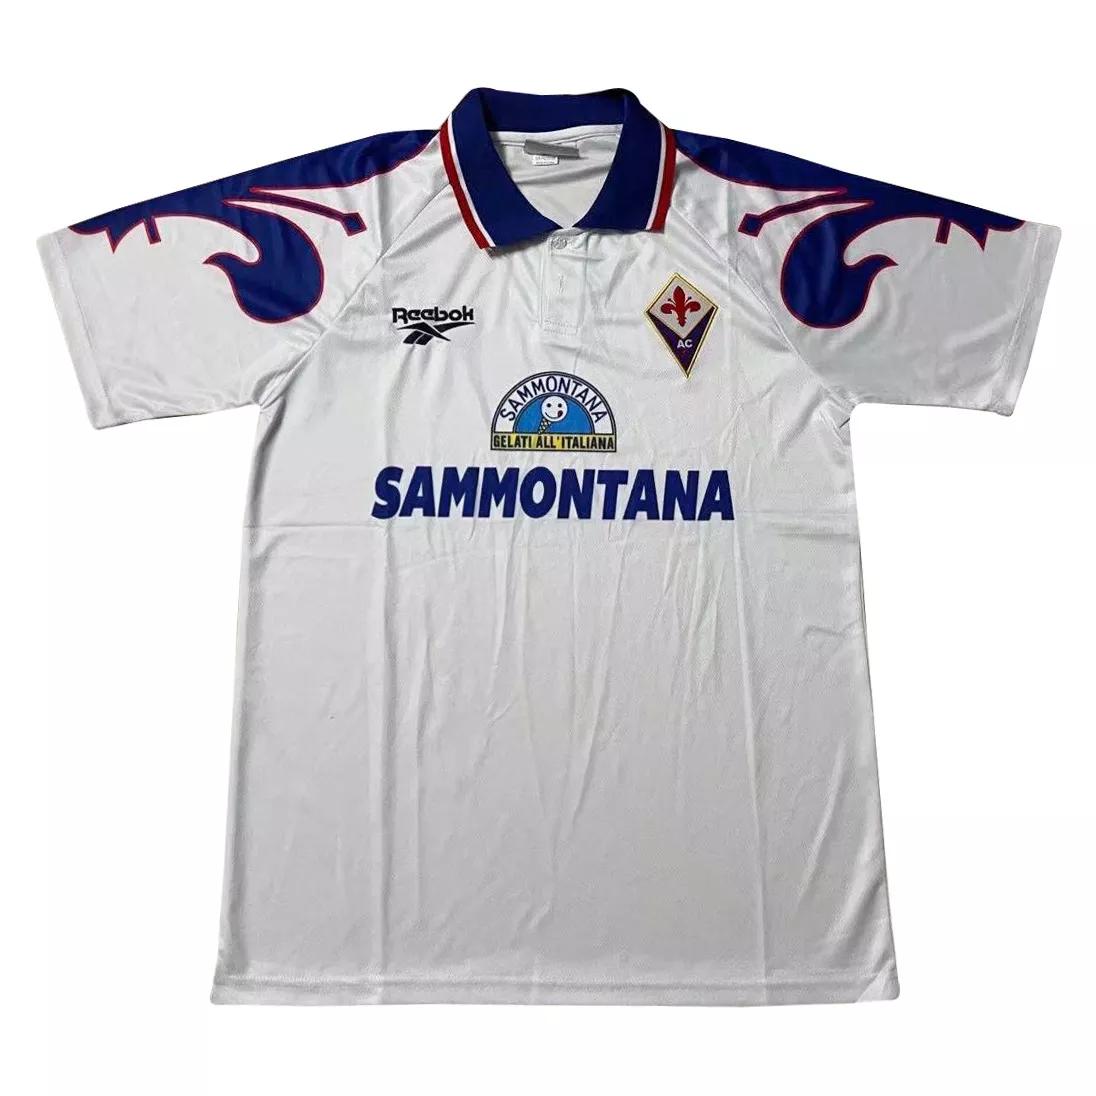 1995-1996 Fiorentina away retro jersey